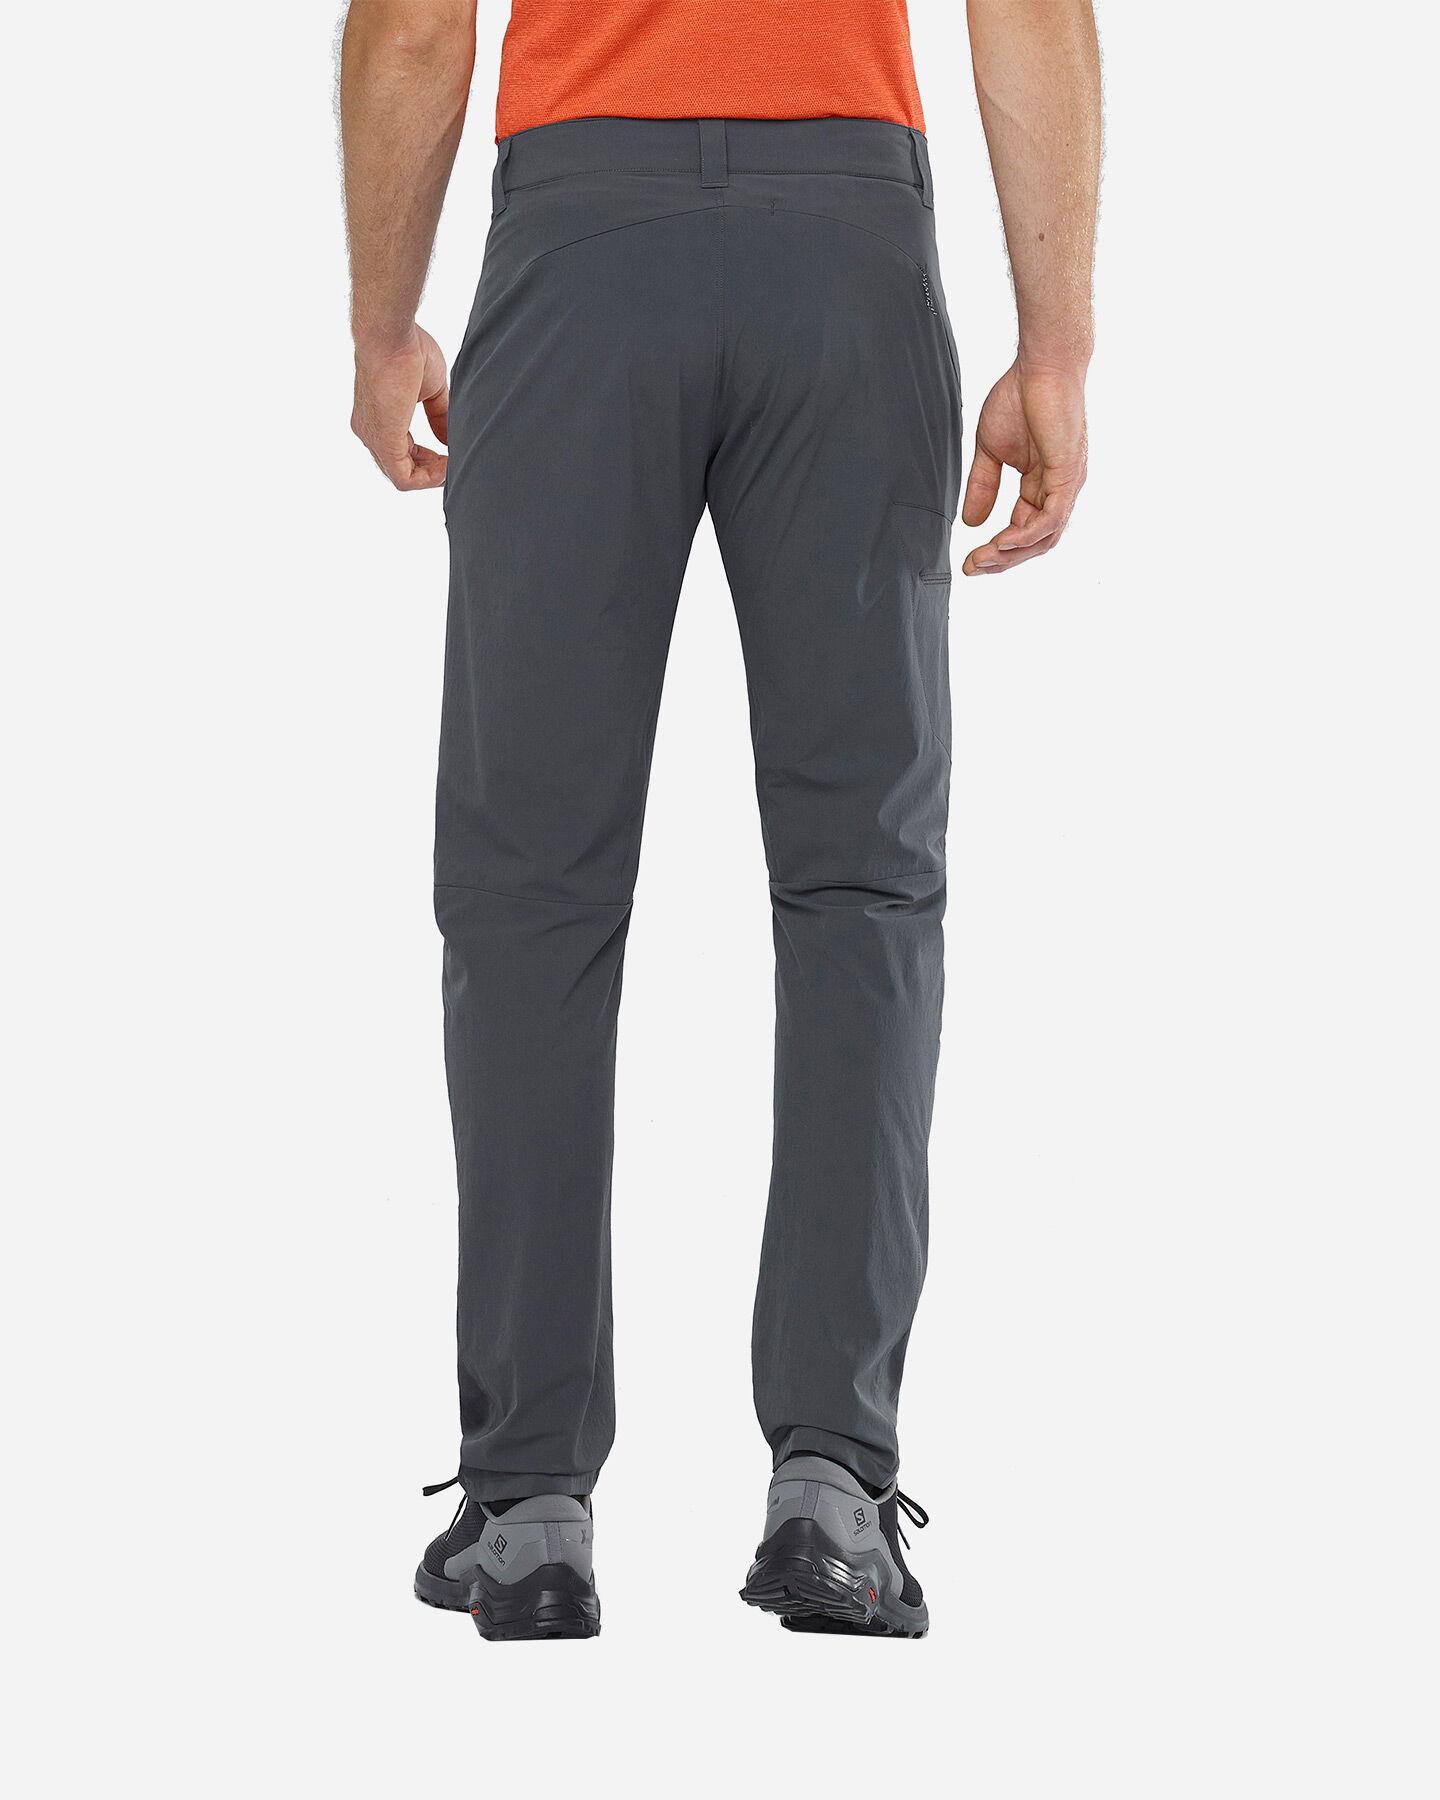 Pantalone outdoor SALOMON WAYFARER M S5173871 scatto 4